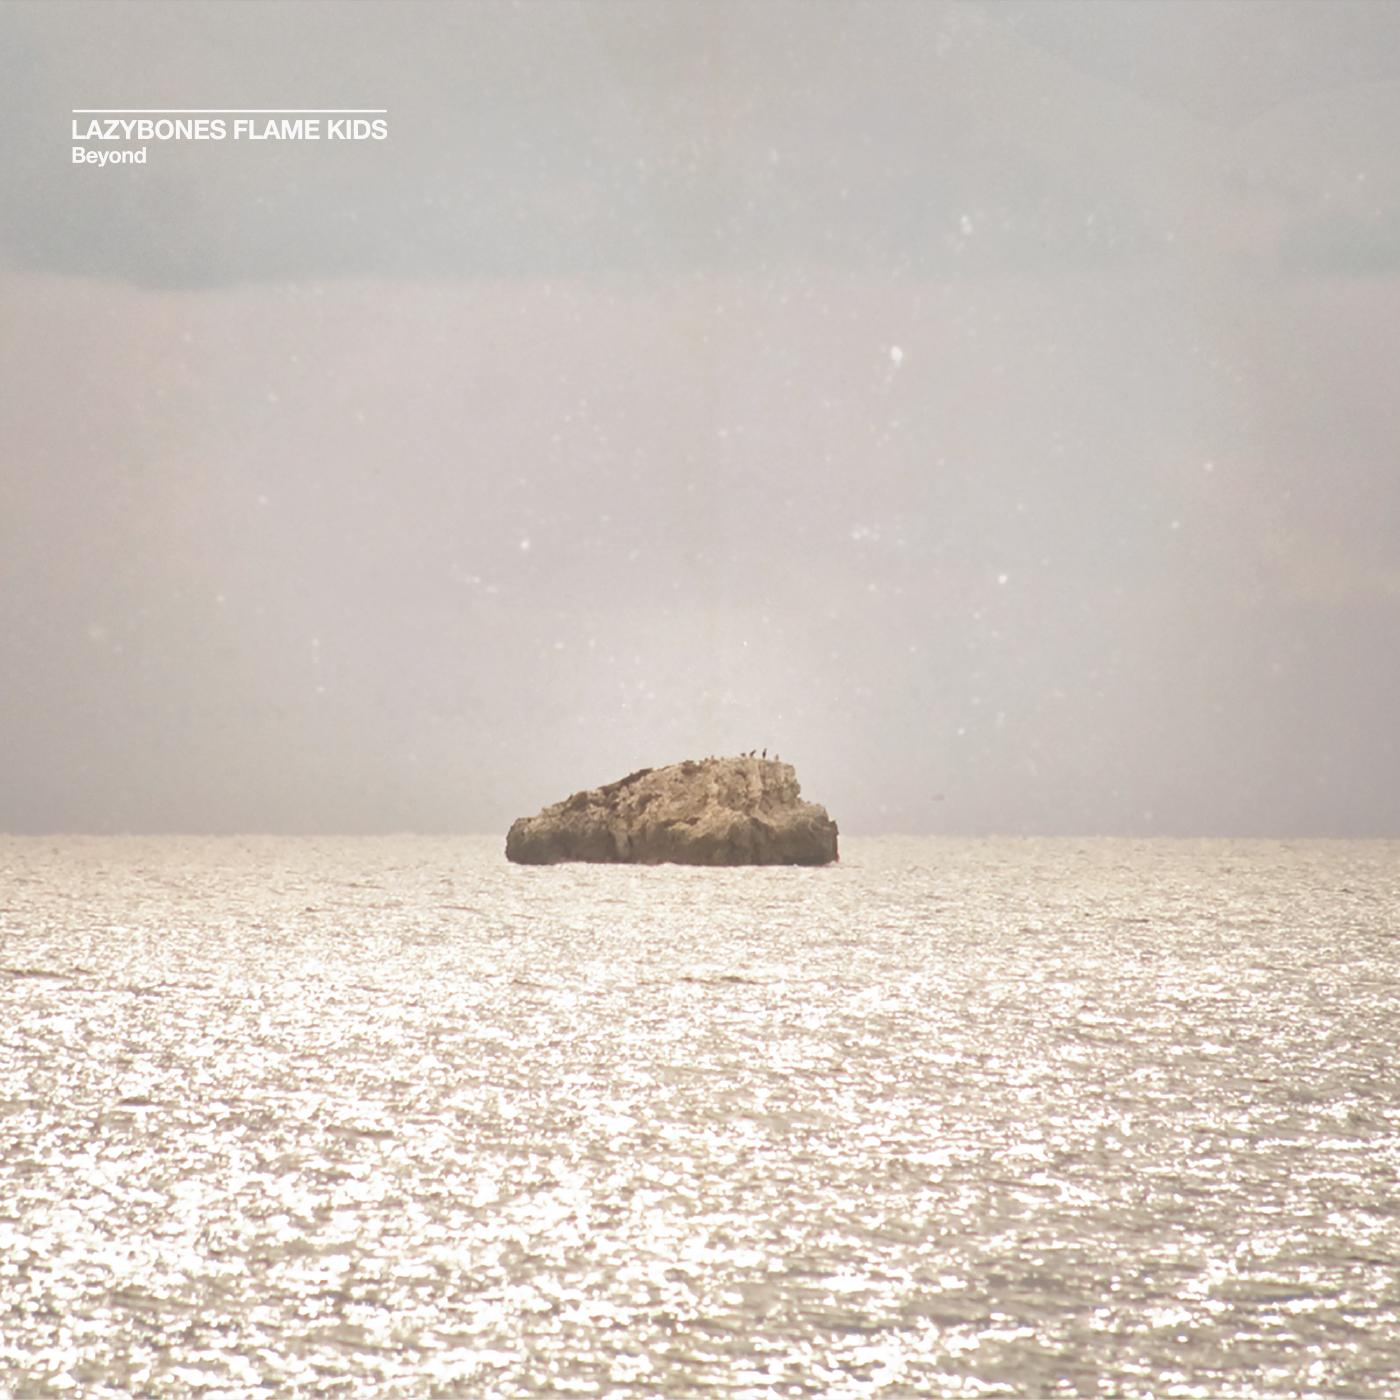 lazybones-flame-kids-beyond-postrock-aus-sardinien-album-review